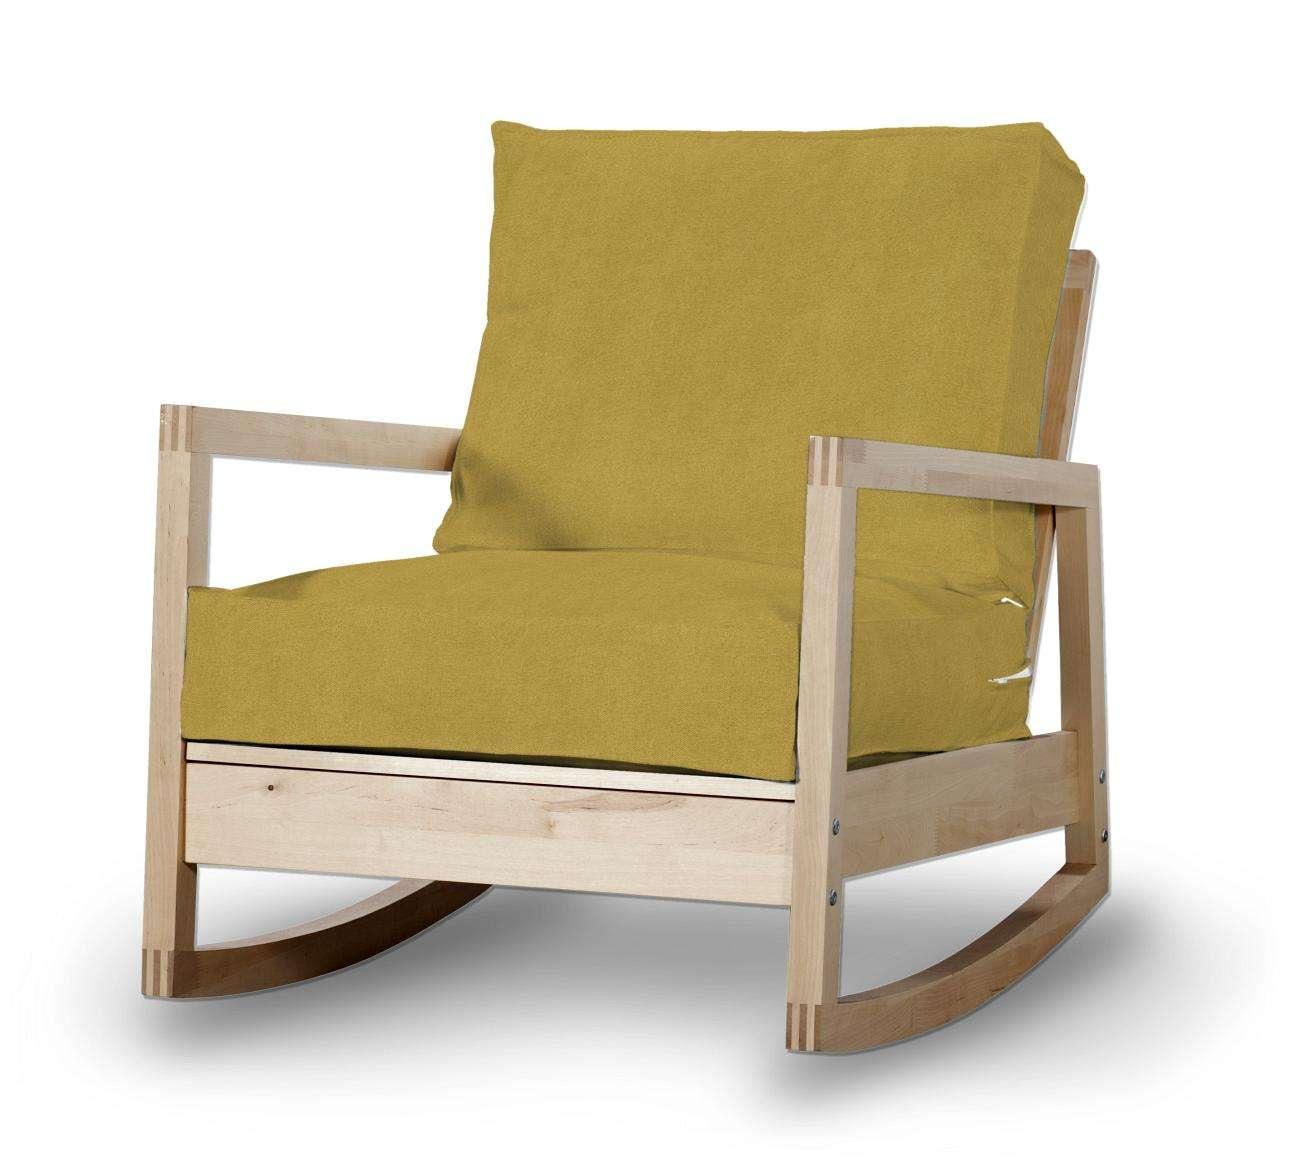 Pokrowiec na fotel Lillberg Fotel Lillberg w kolekcji Etna , tkanina: 705-04